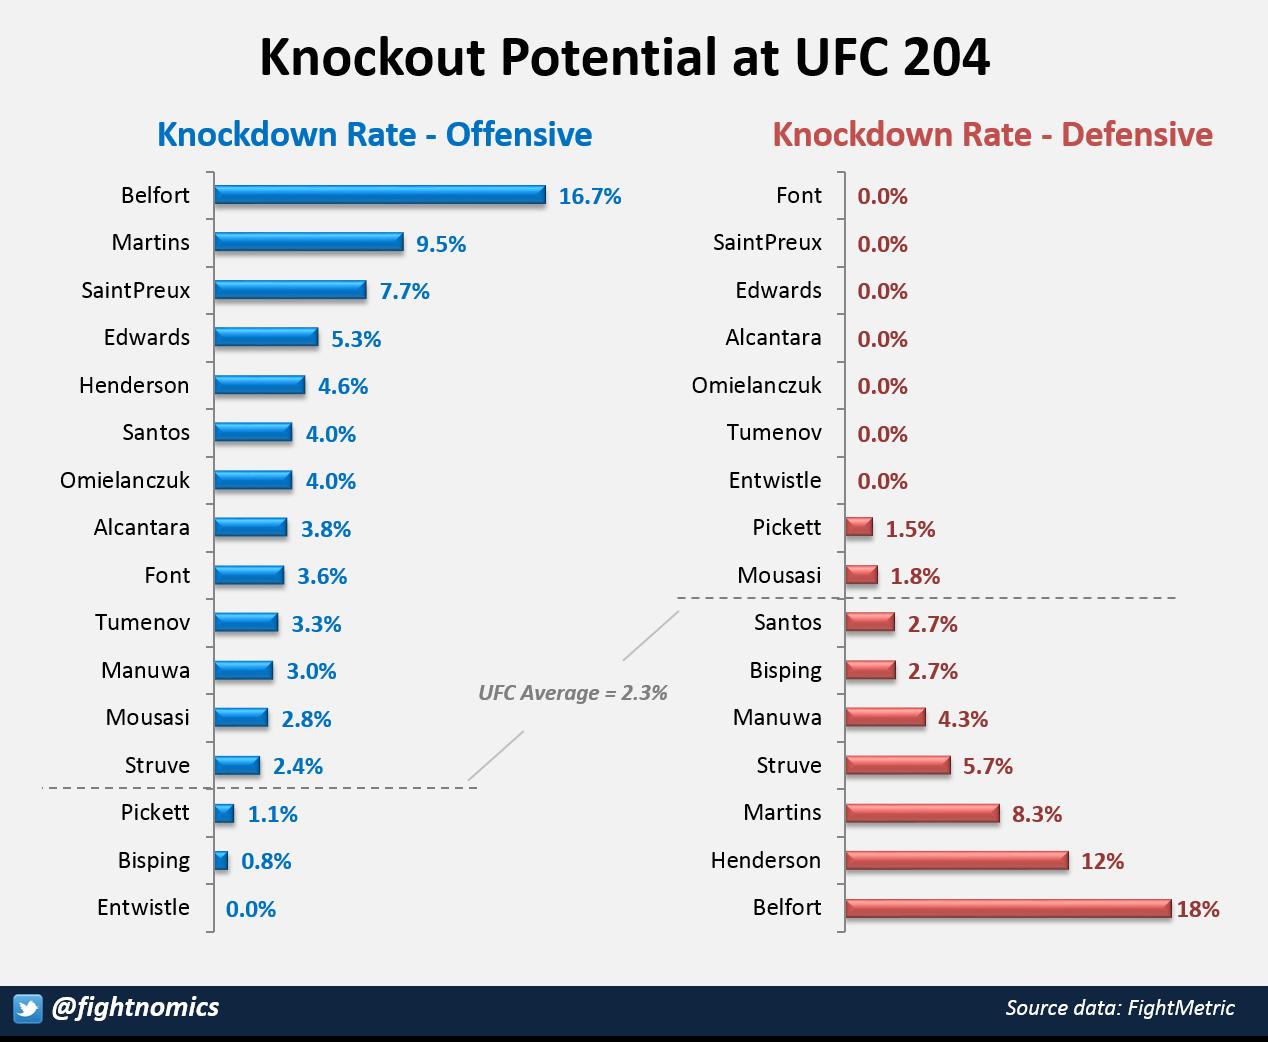 KO Potential UFC 204